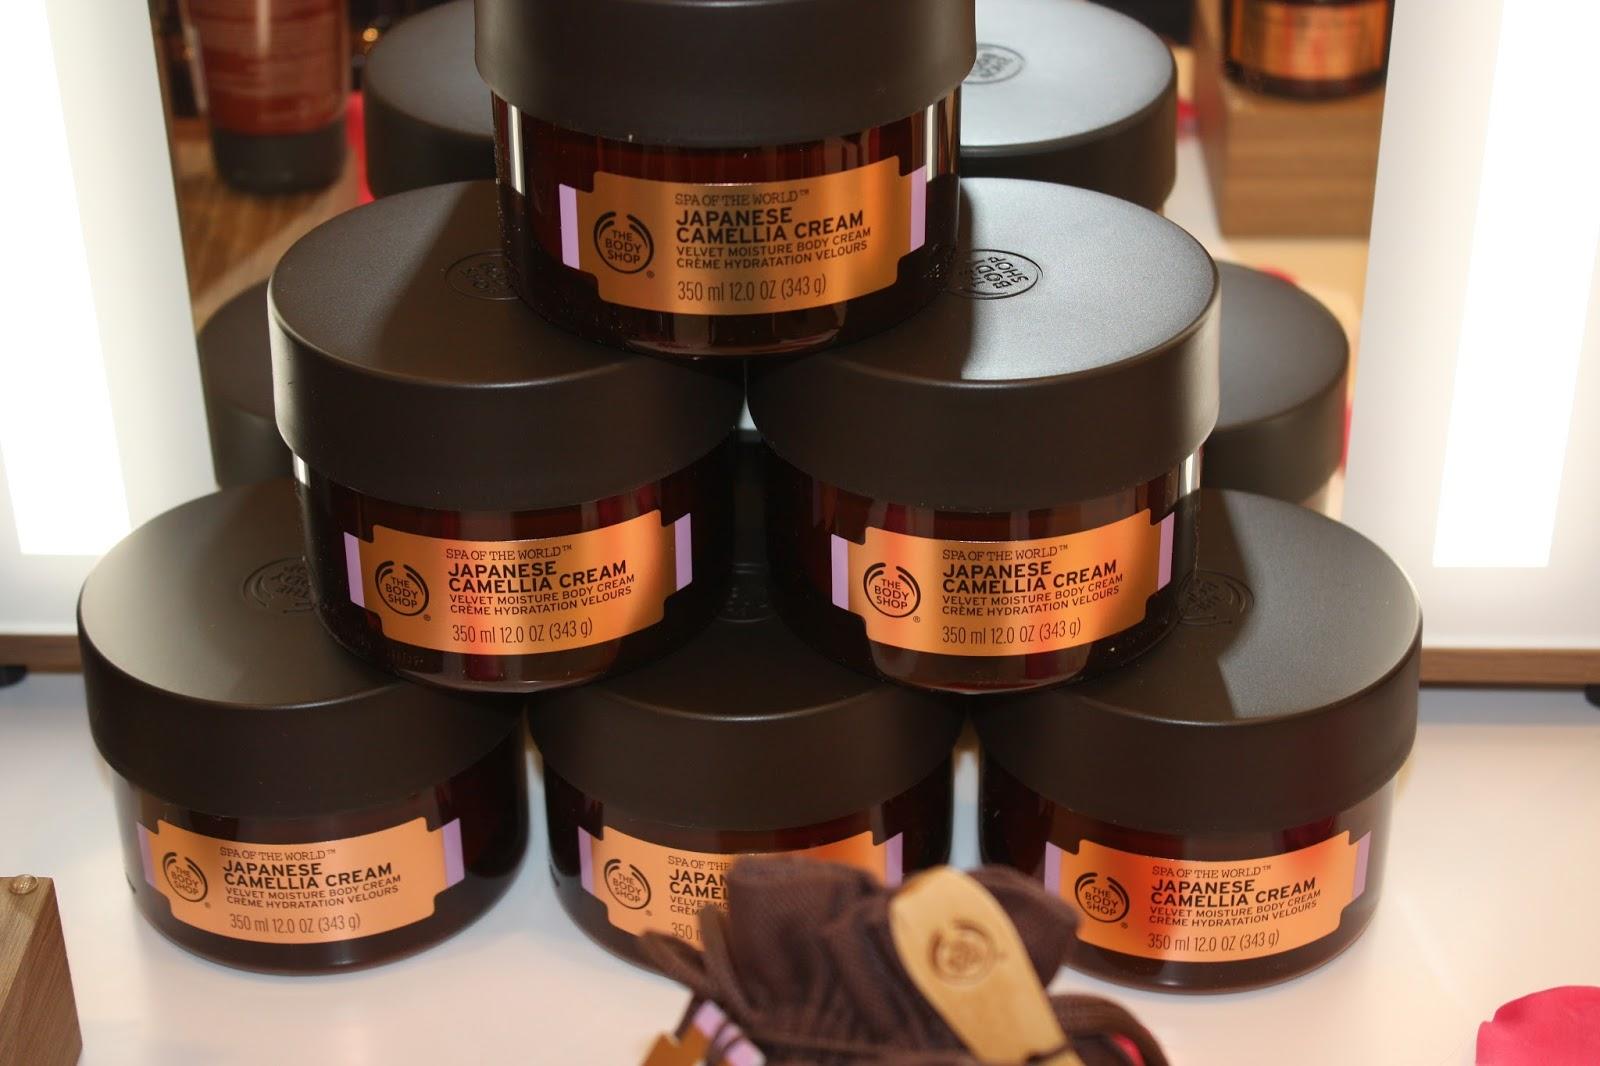 The Body Shop Southampton Spa Of The World Event Japanese Camellia Cream